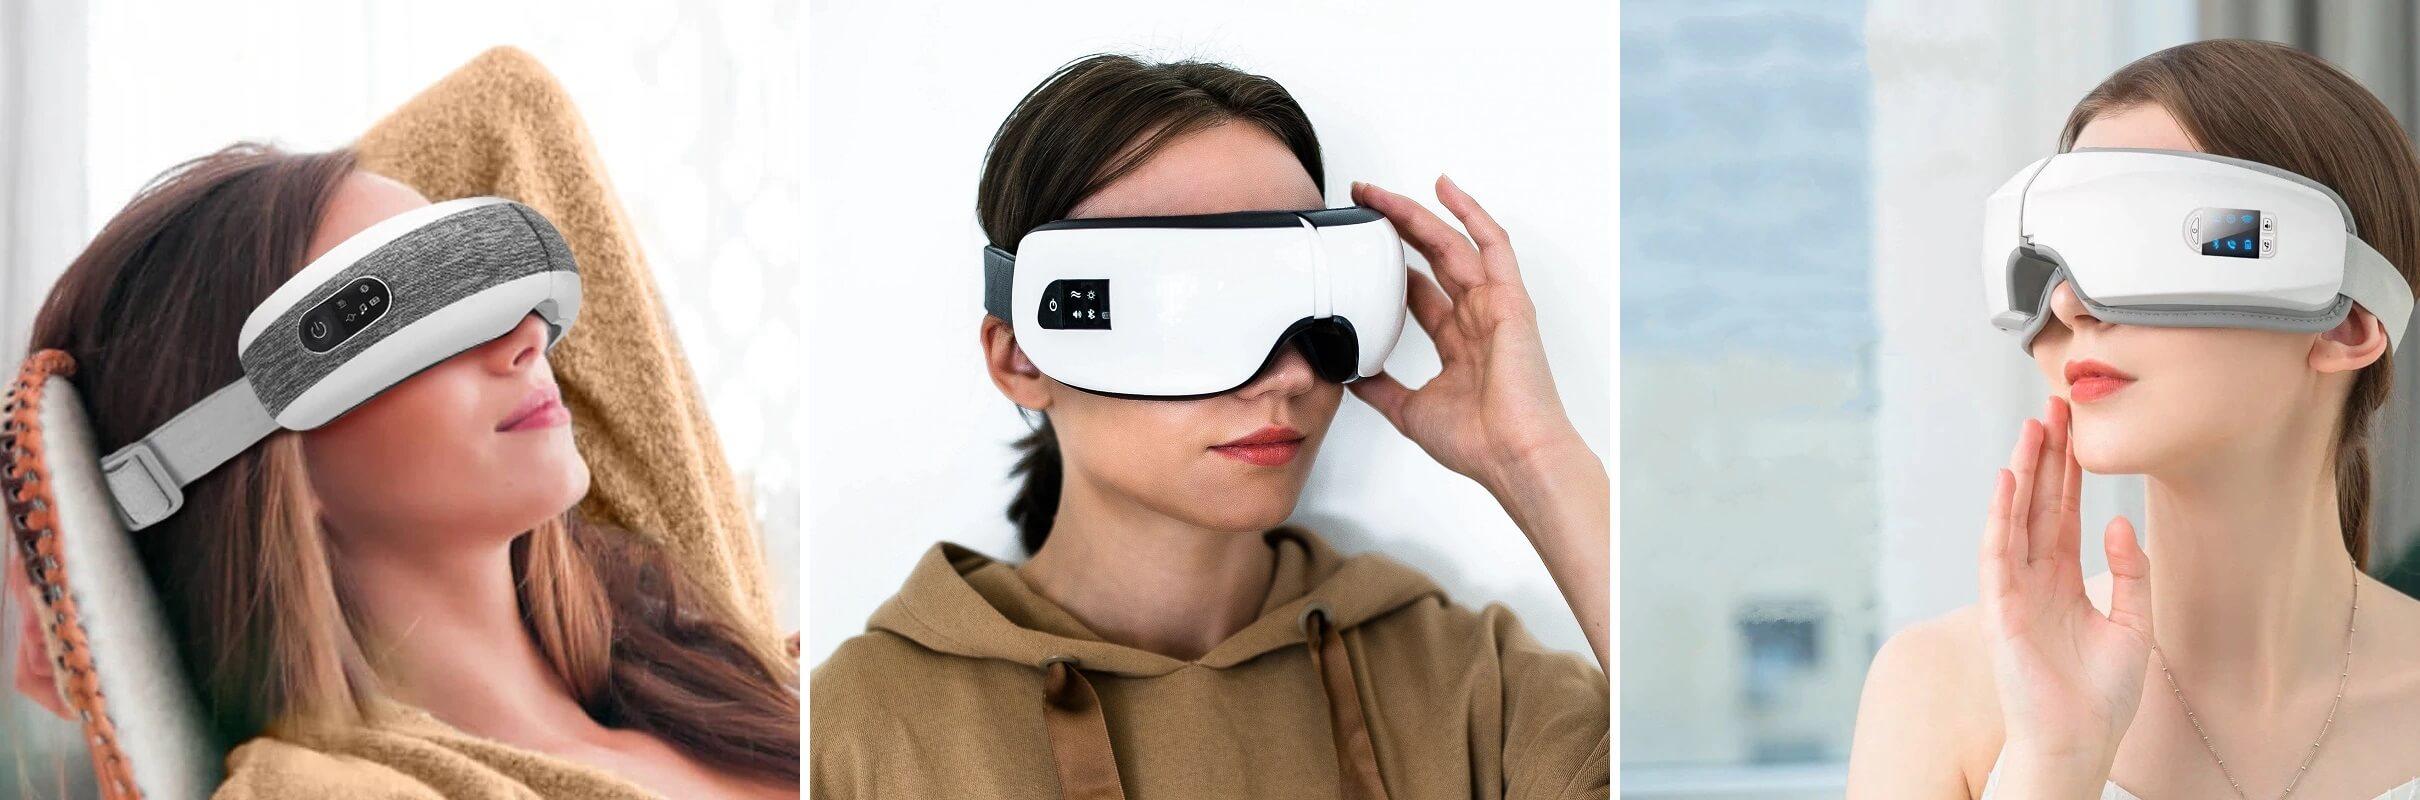 ТОП-10 массажёров для глаз с Алиэкспресс